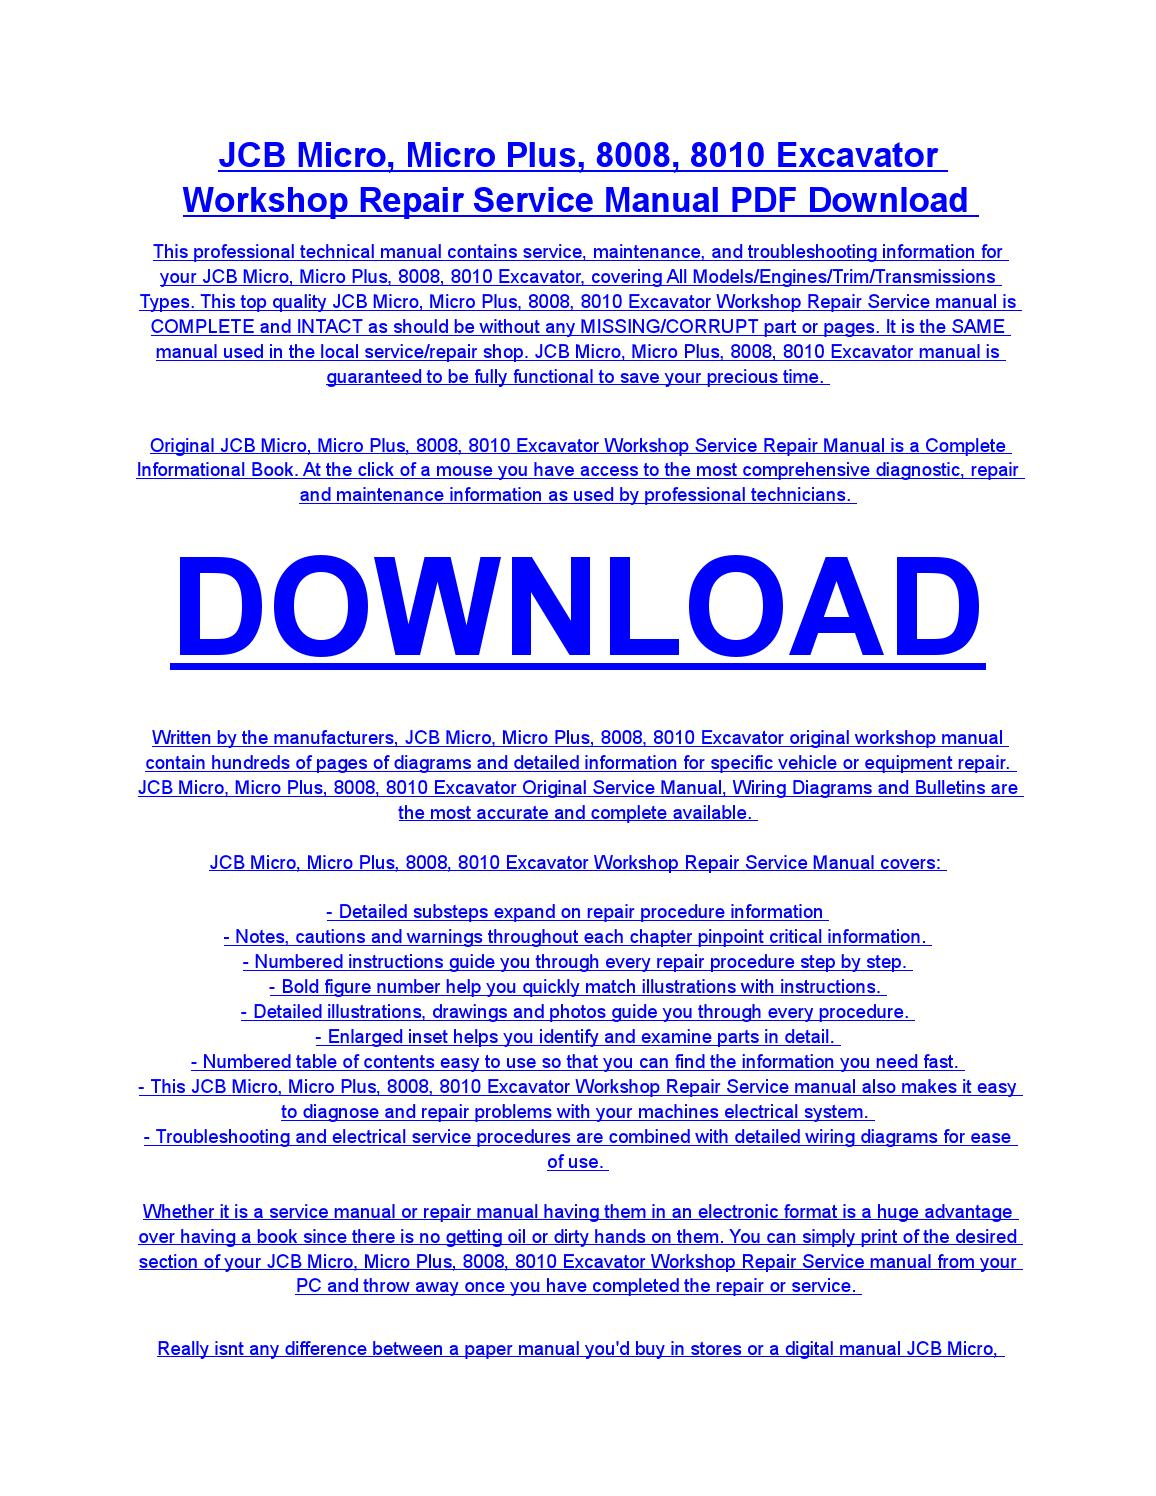 Jcb micro, micro plus, 8008, 8010 excavator service repair workshop manual  download by diaz rondon - issuu